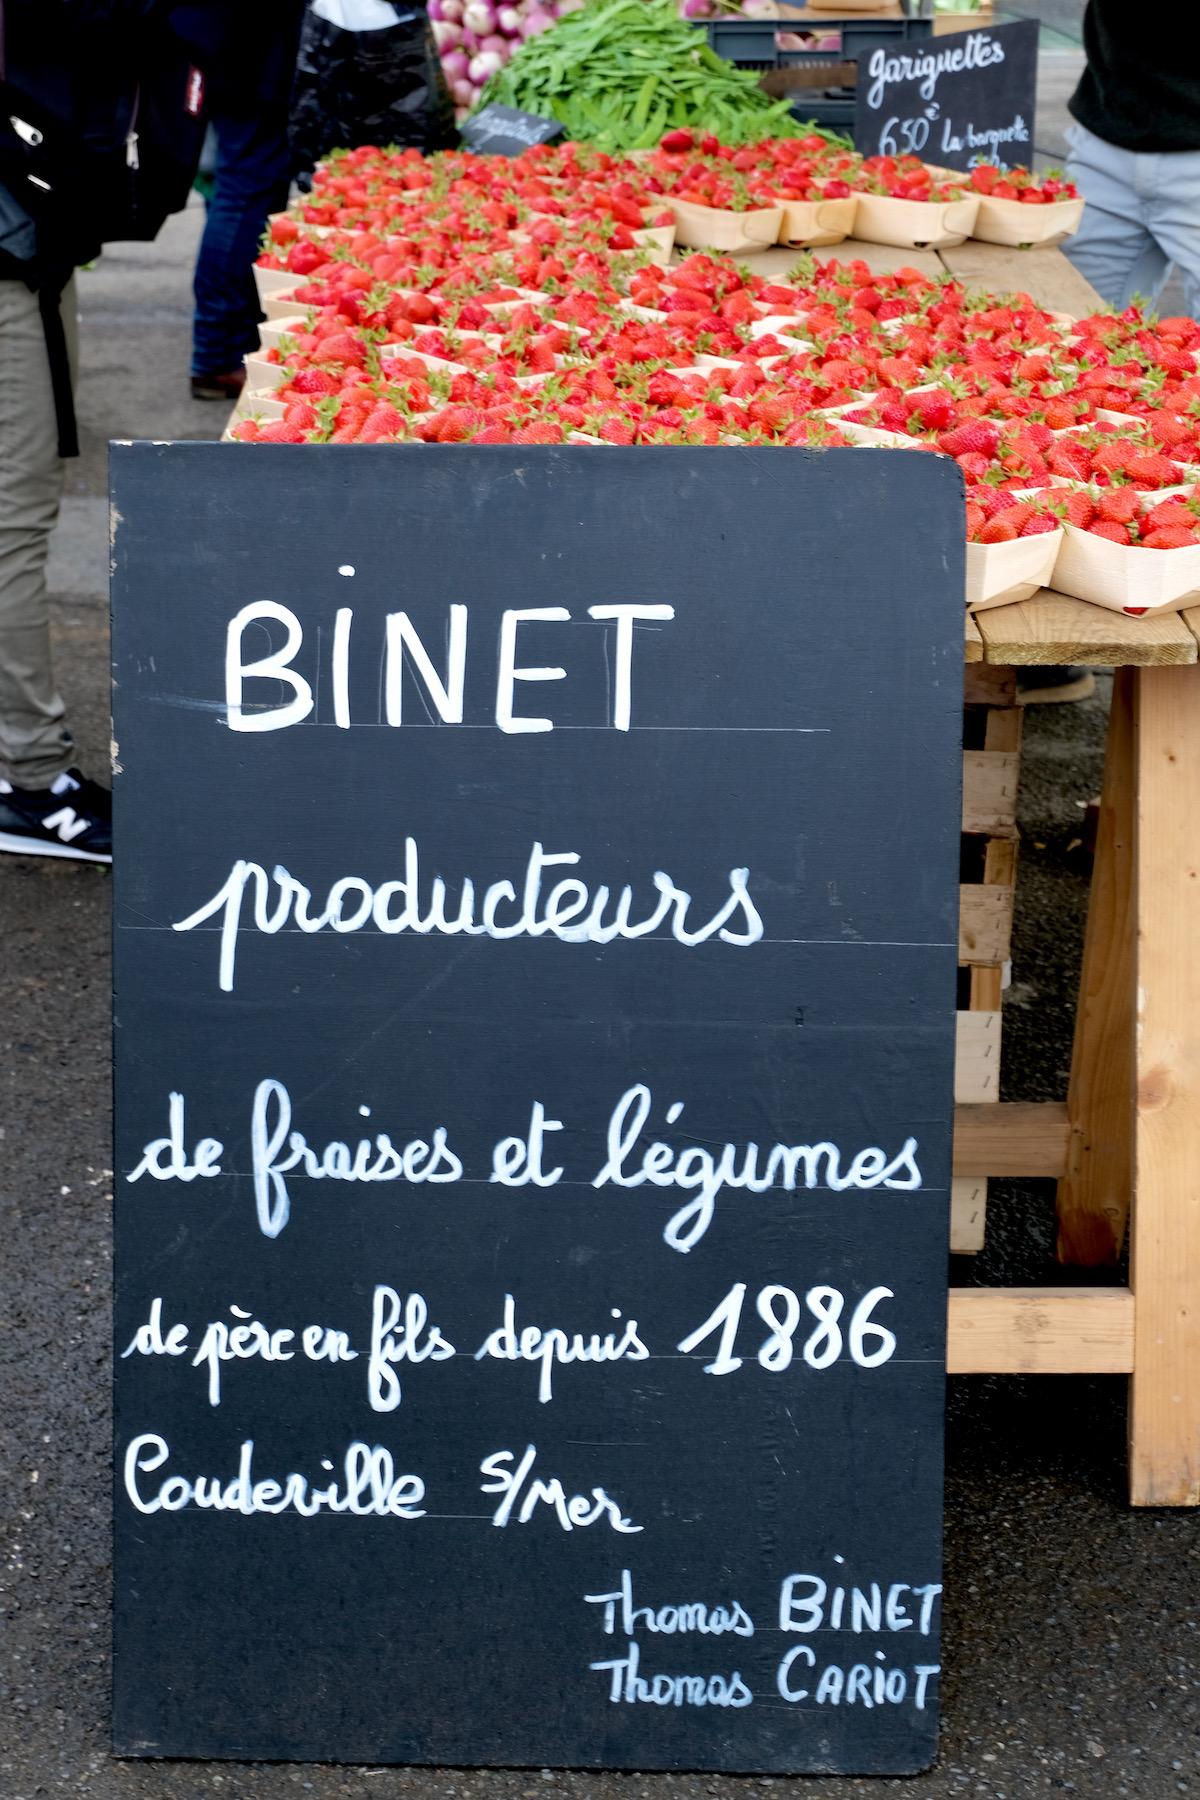 normandy market strawberries